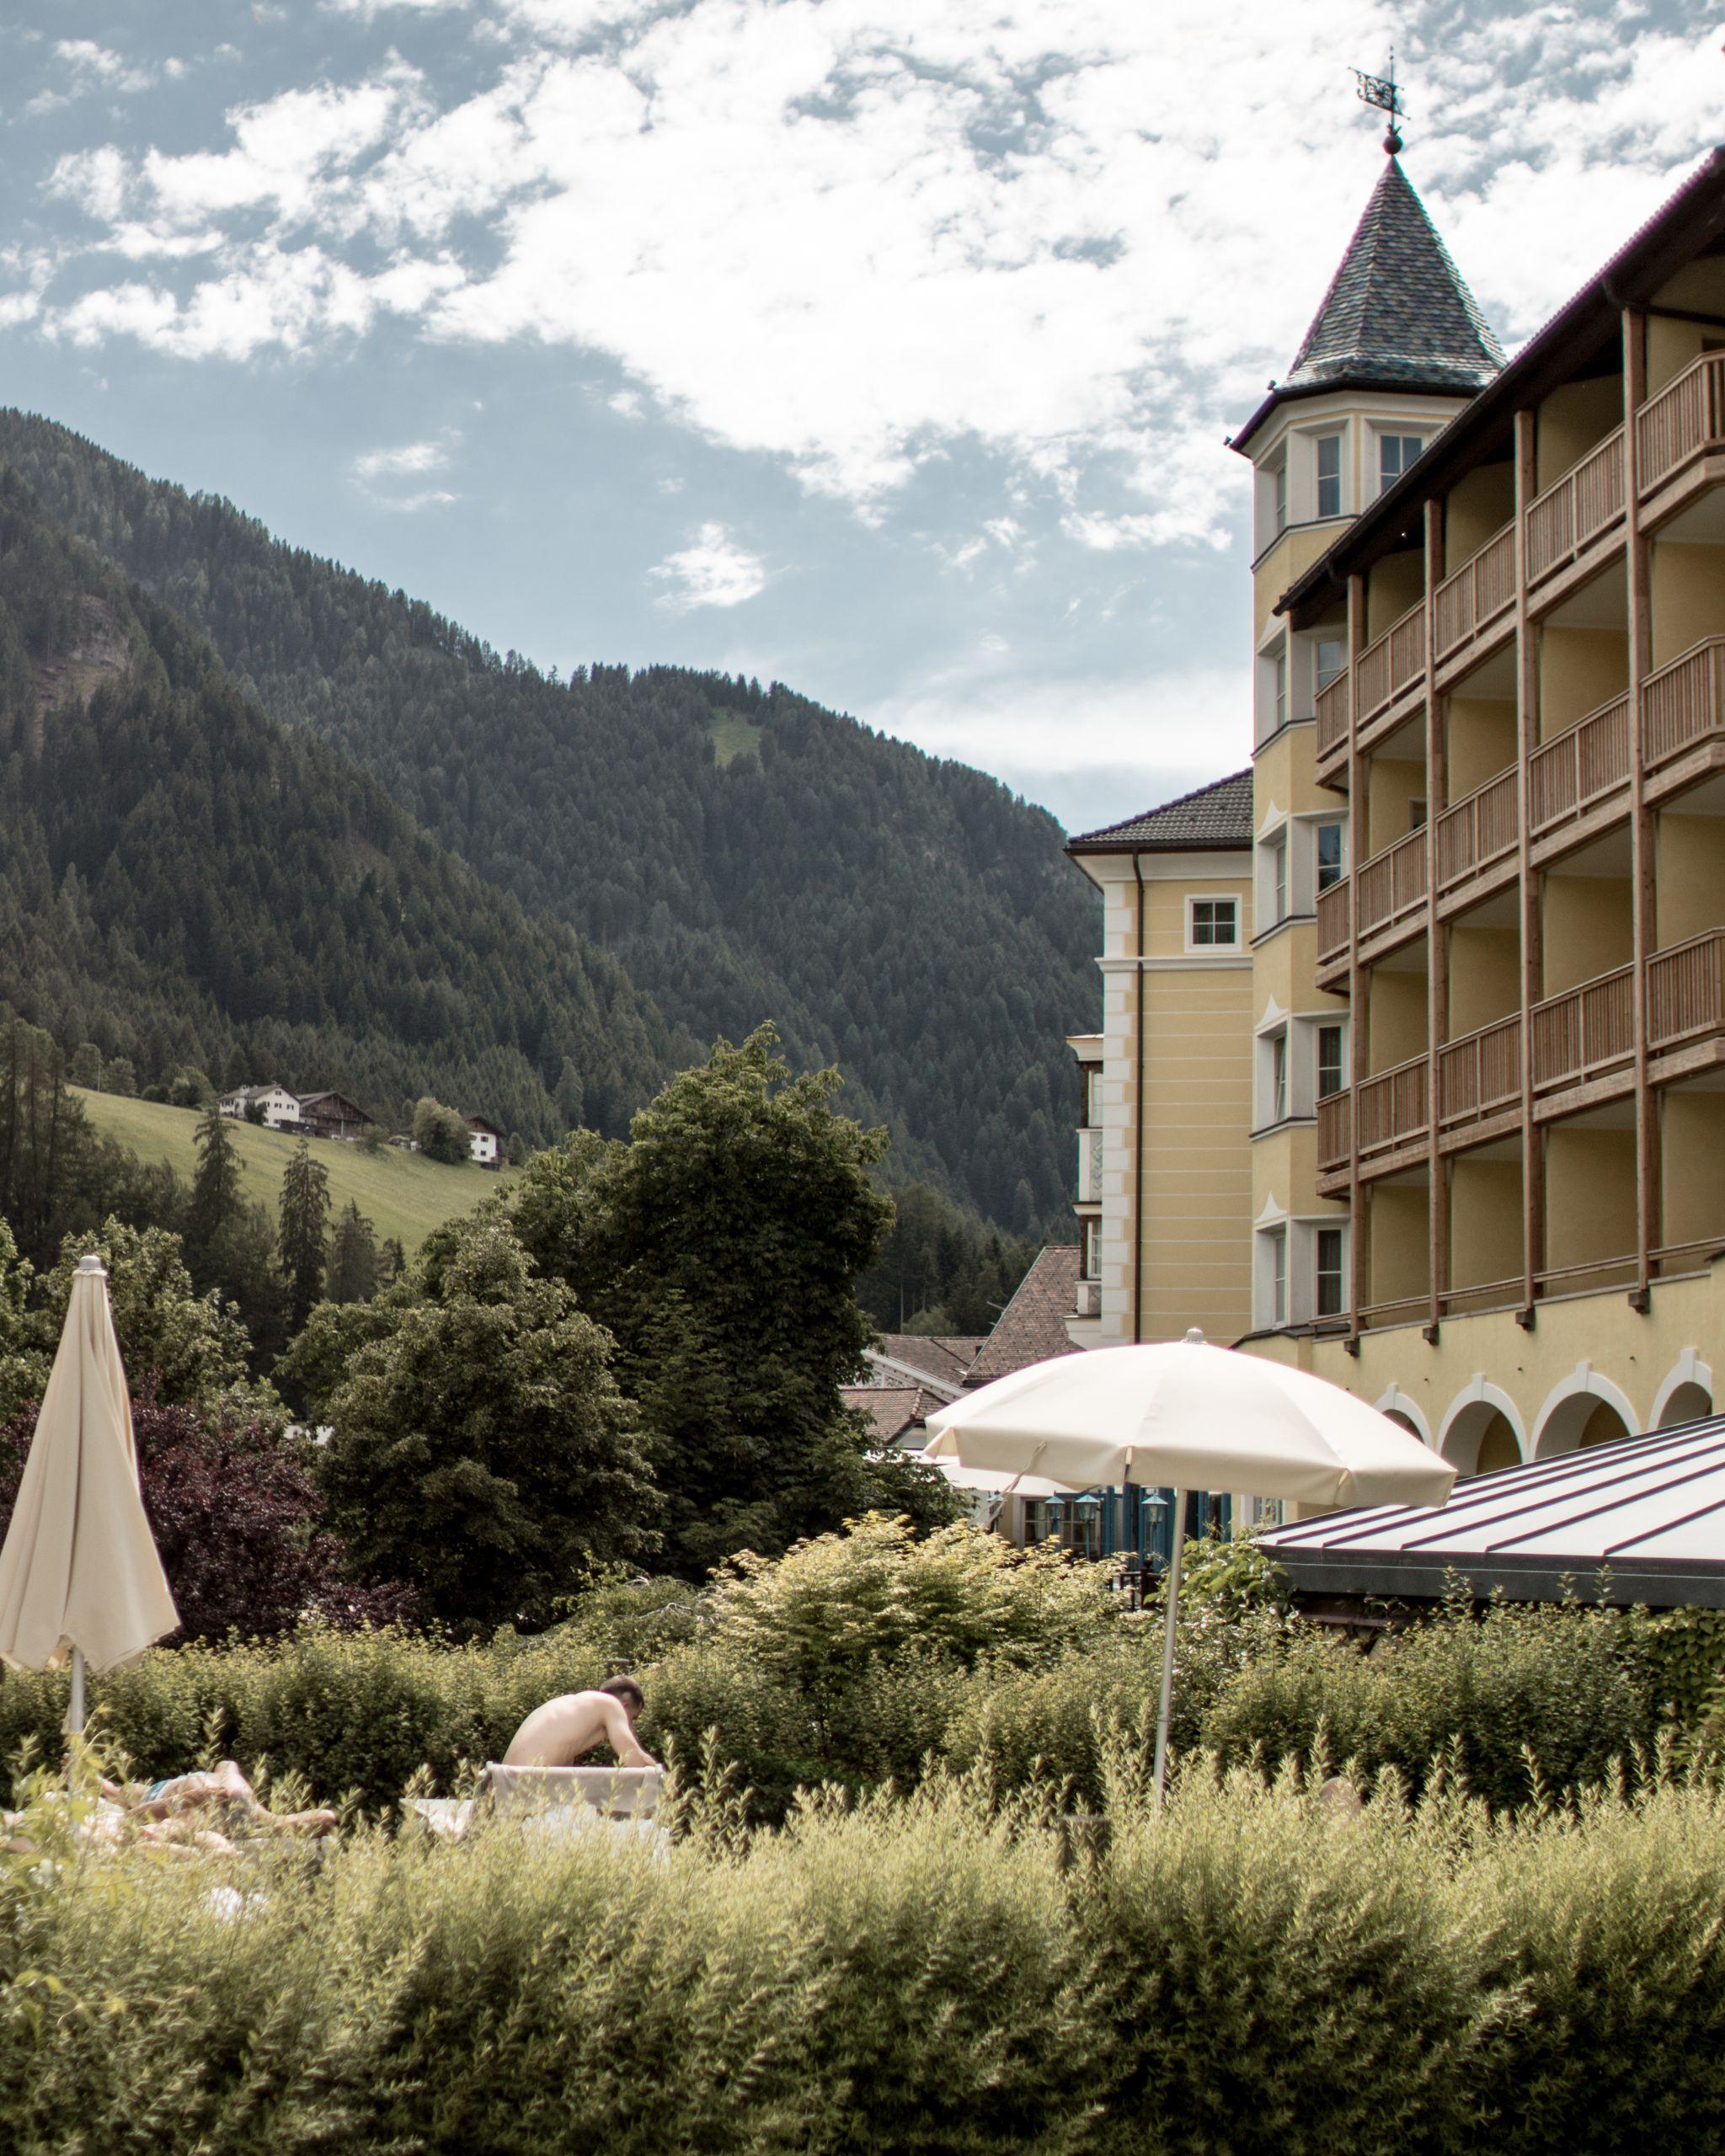 Adler Dolomites Ortisei Italy Hotel Hospitality Brand Photography Exterior Pool Sunshine